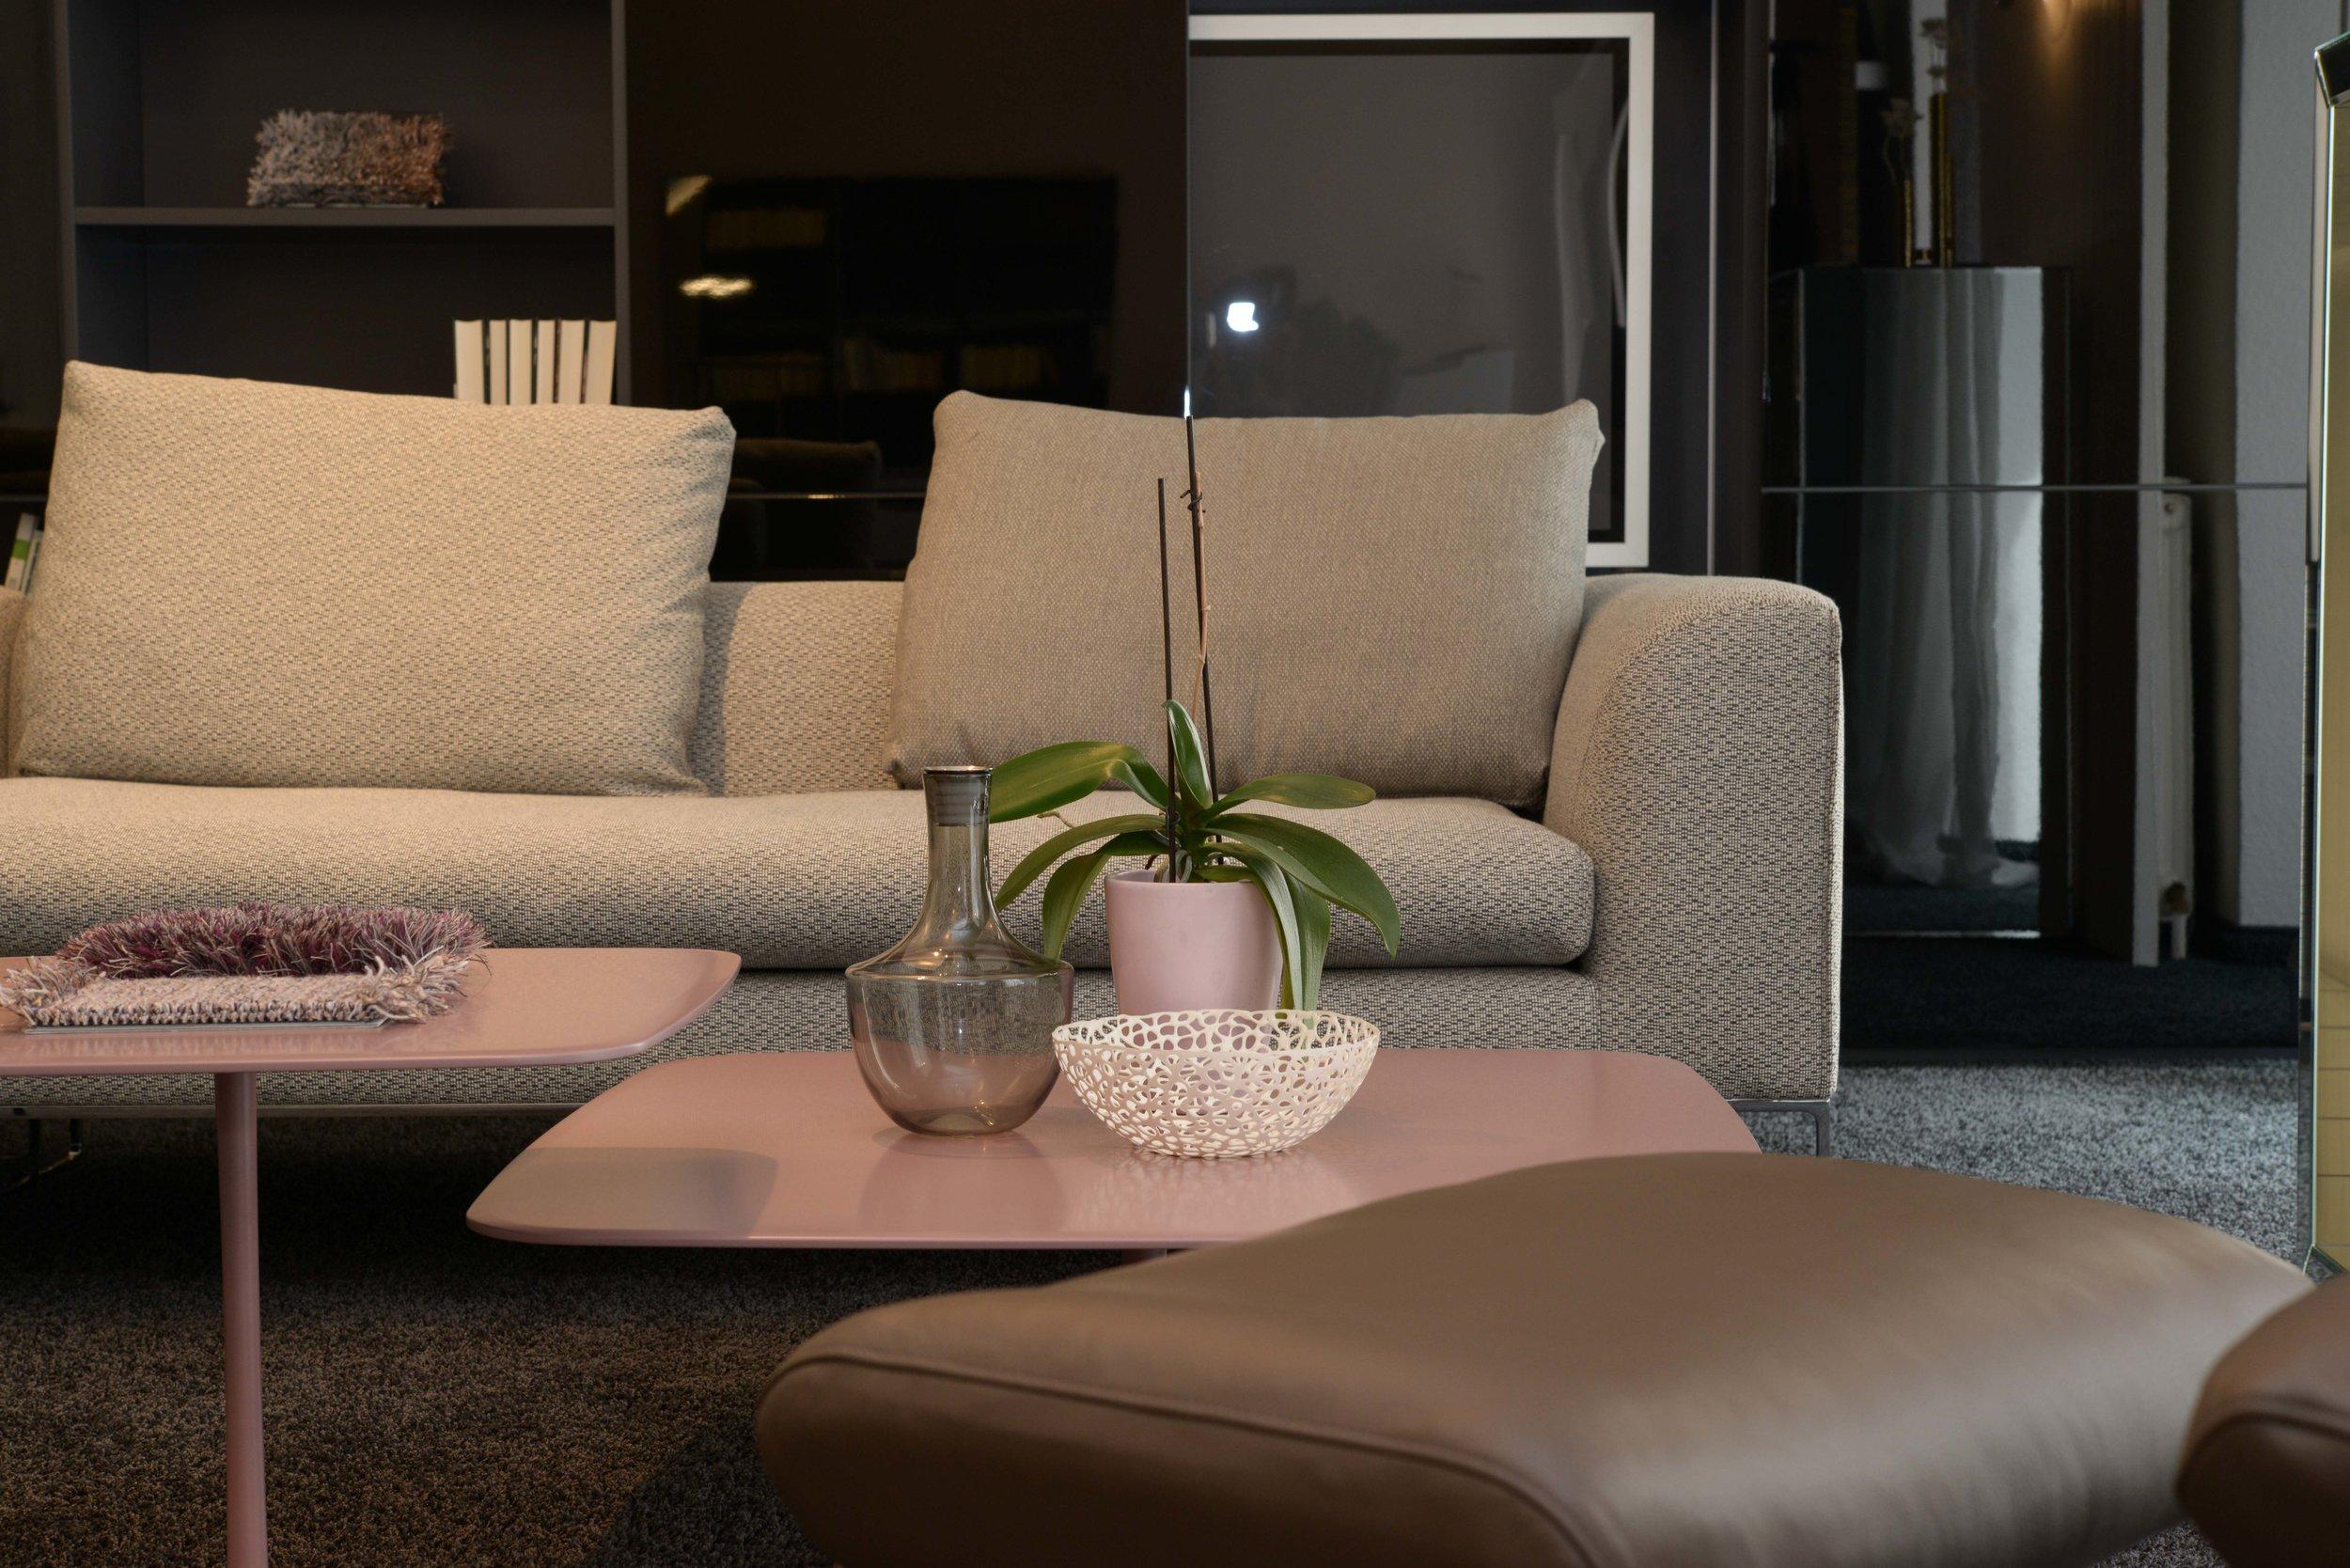 wohnerei tischlerei wohncontact fellinger Ebreichsdorf Sofa cor mell 1.jpg